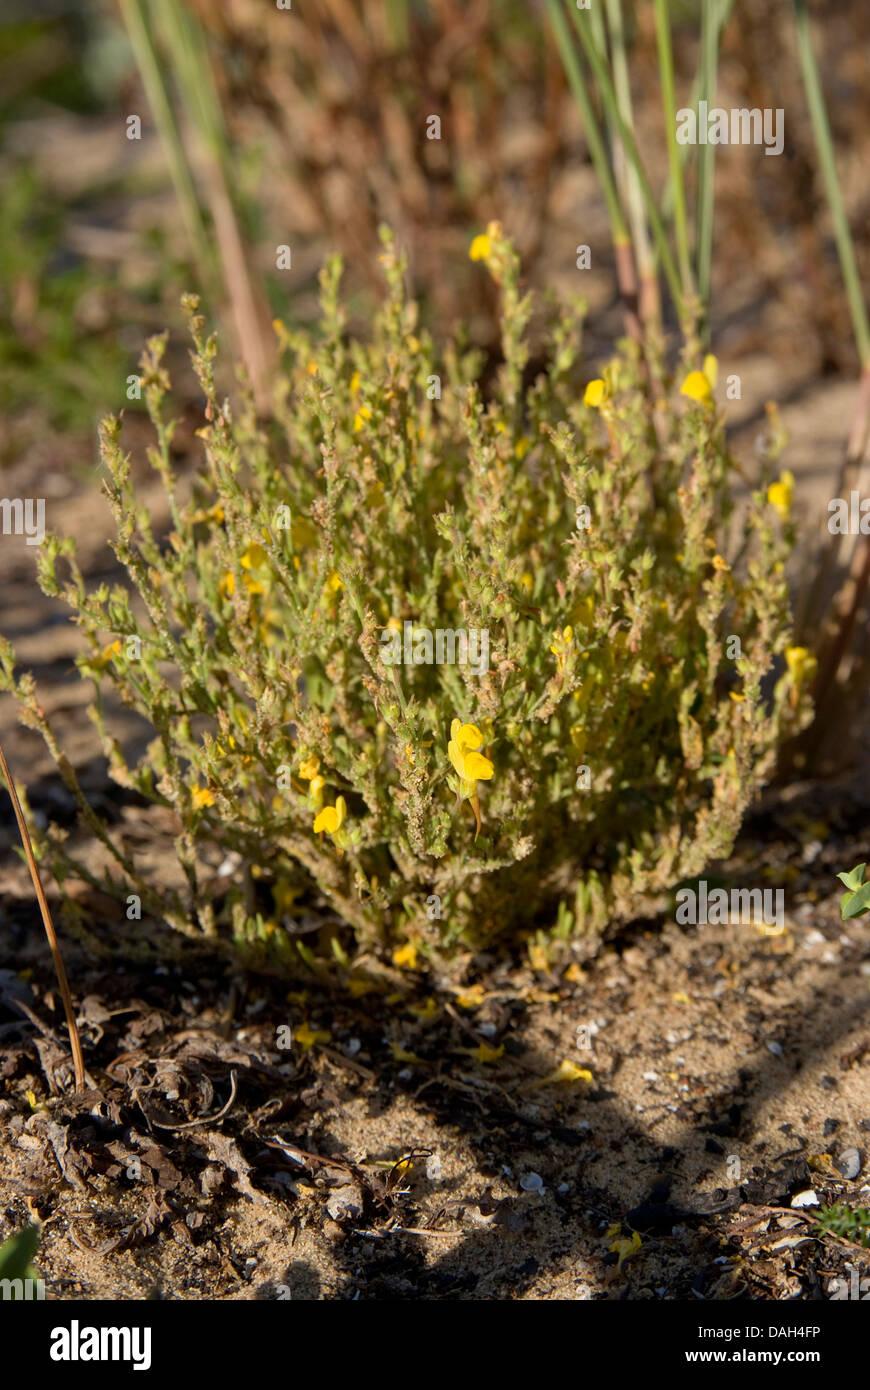 Toadflax (Linaria bipunctata subsp. glutinosa), blooming, Portugal, Aljezur - Stock Image